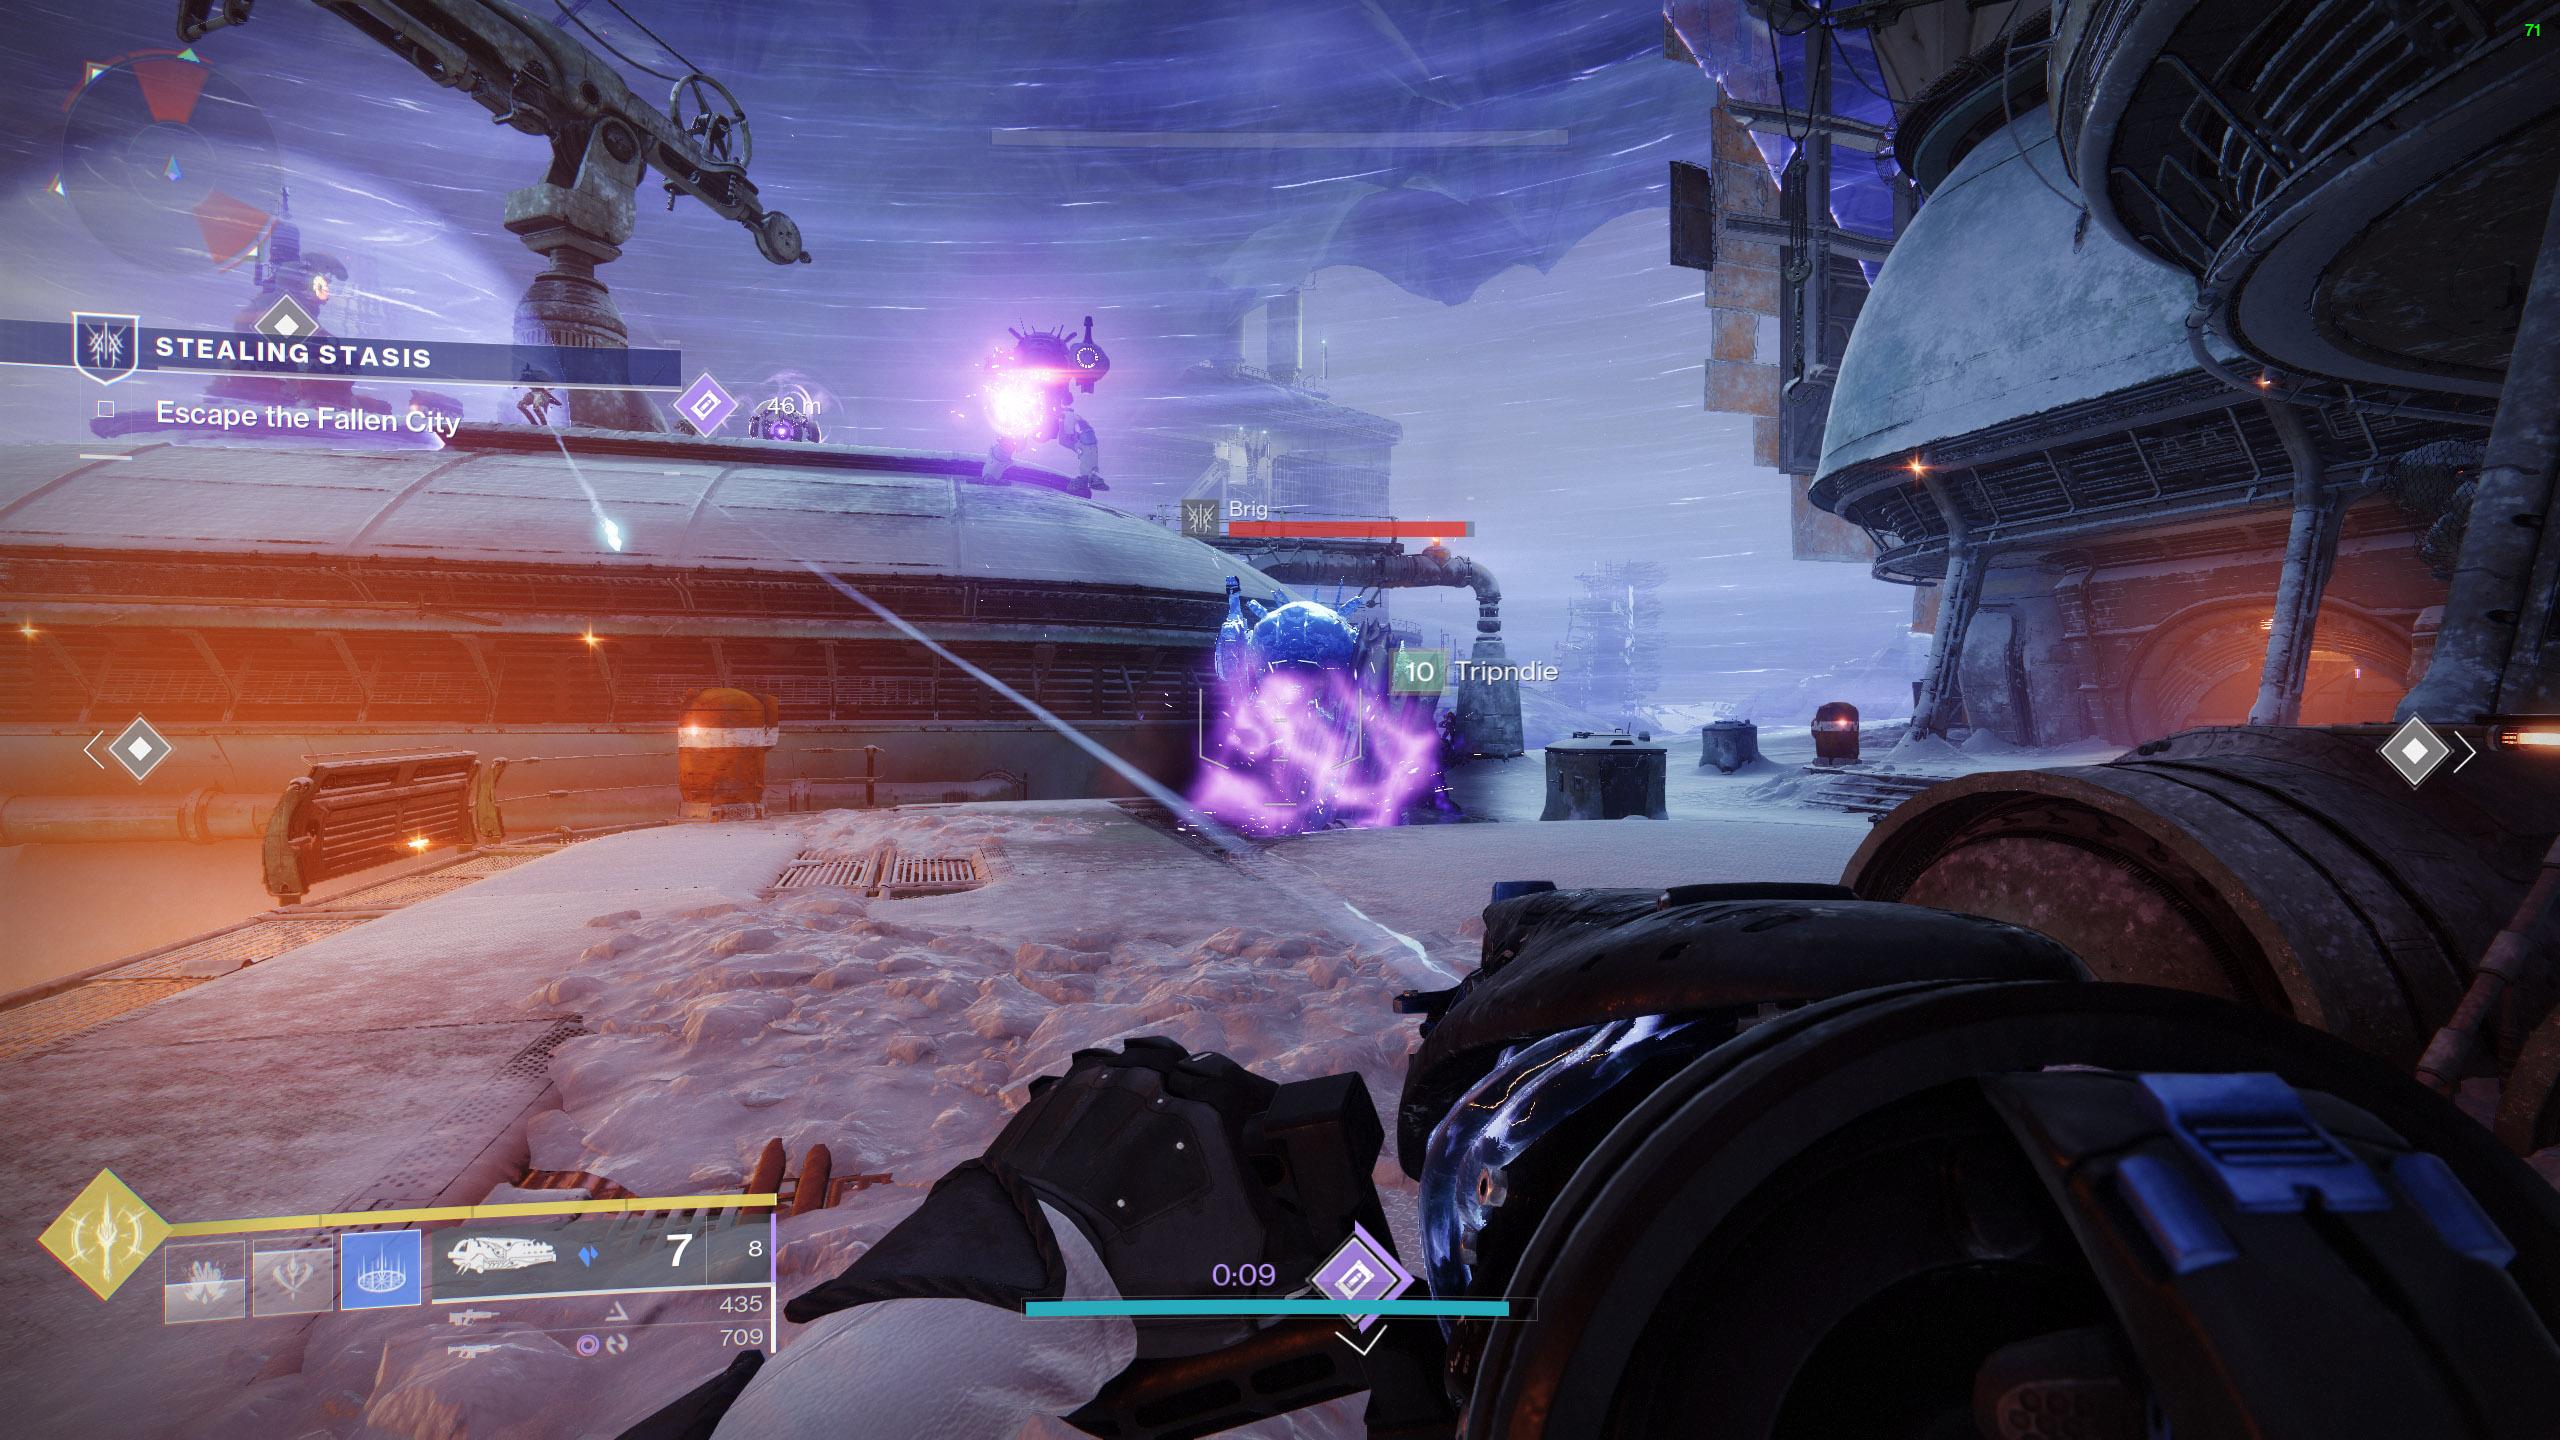 destiny 2 stealing stasis